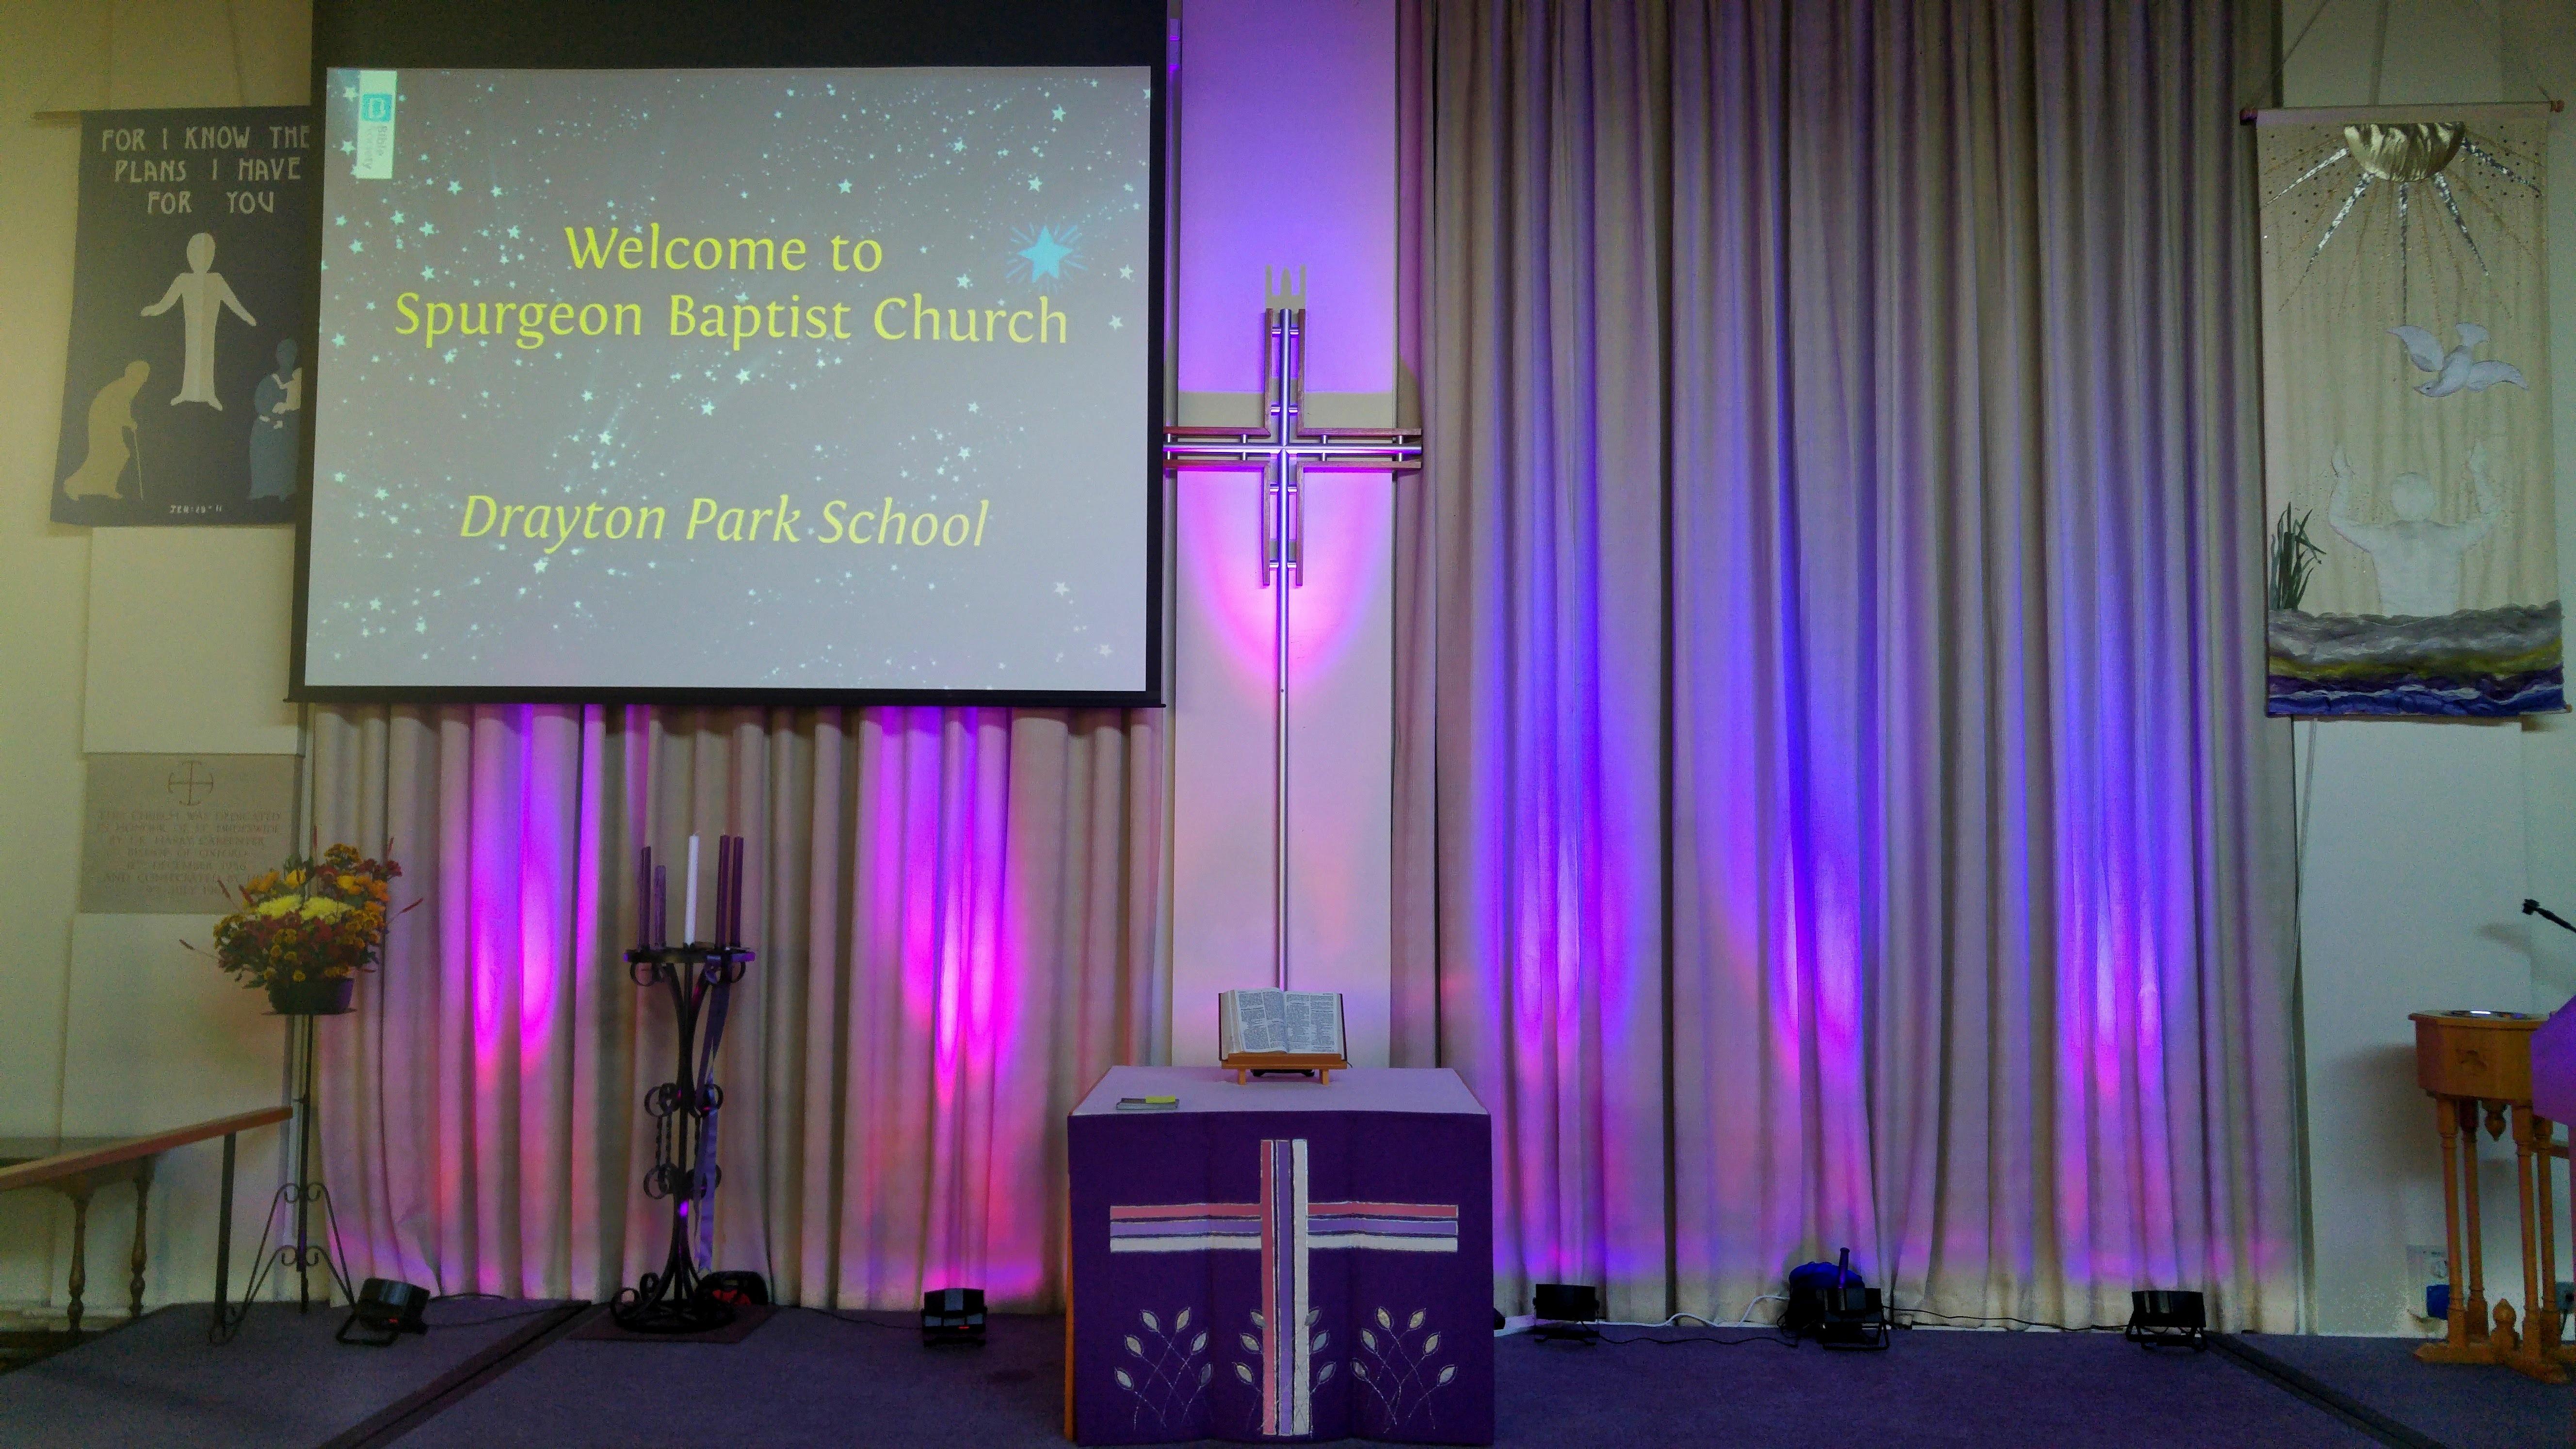 Welcome to Spurgeon Baptist Church